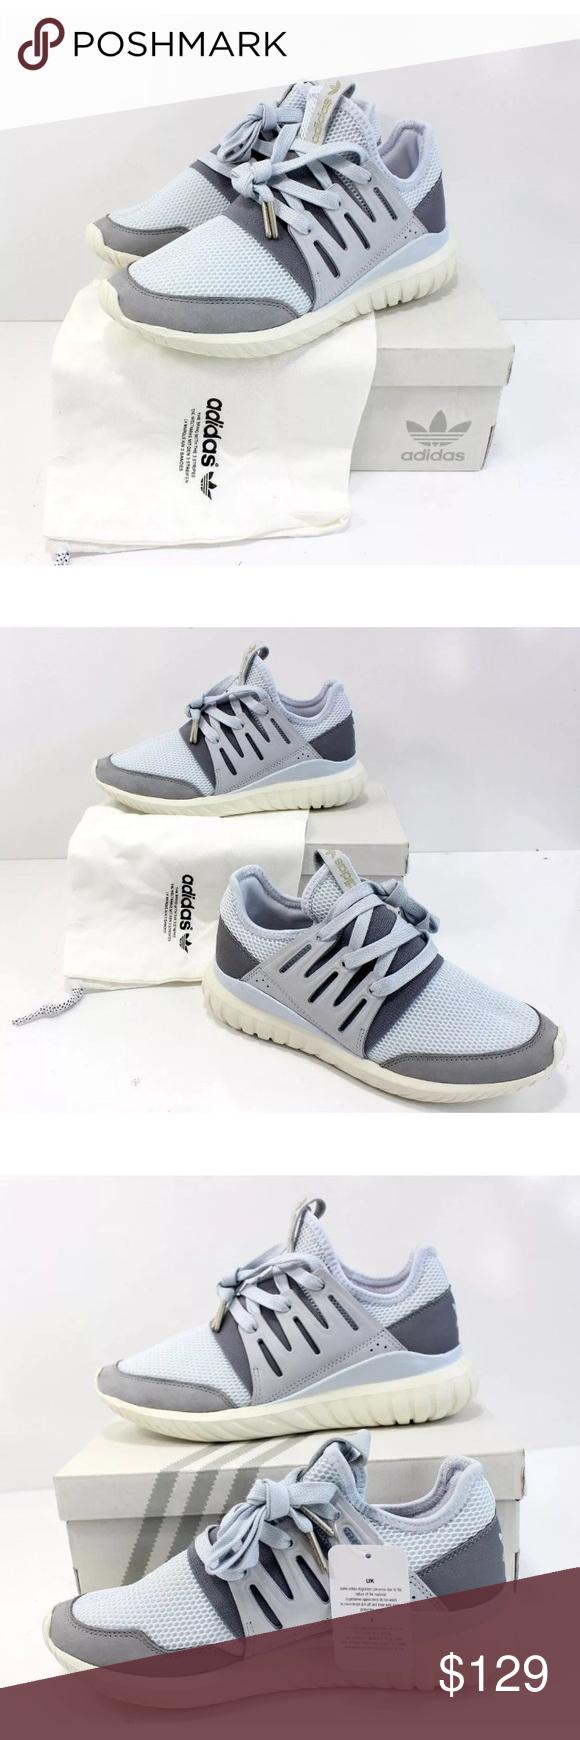 new concept d3f5f 77369 Women Adidas Mi Tubular Radial BA7379 Custom Shoes Women's ...